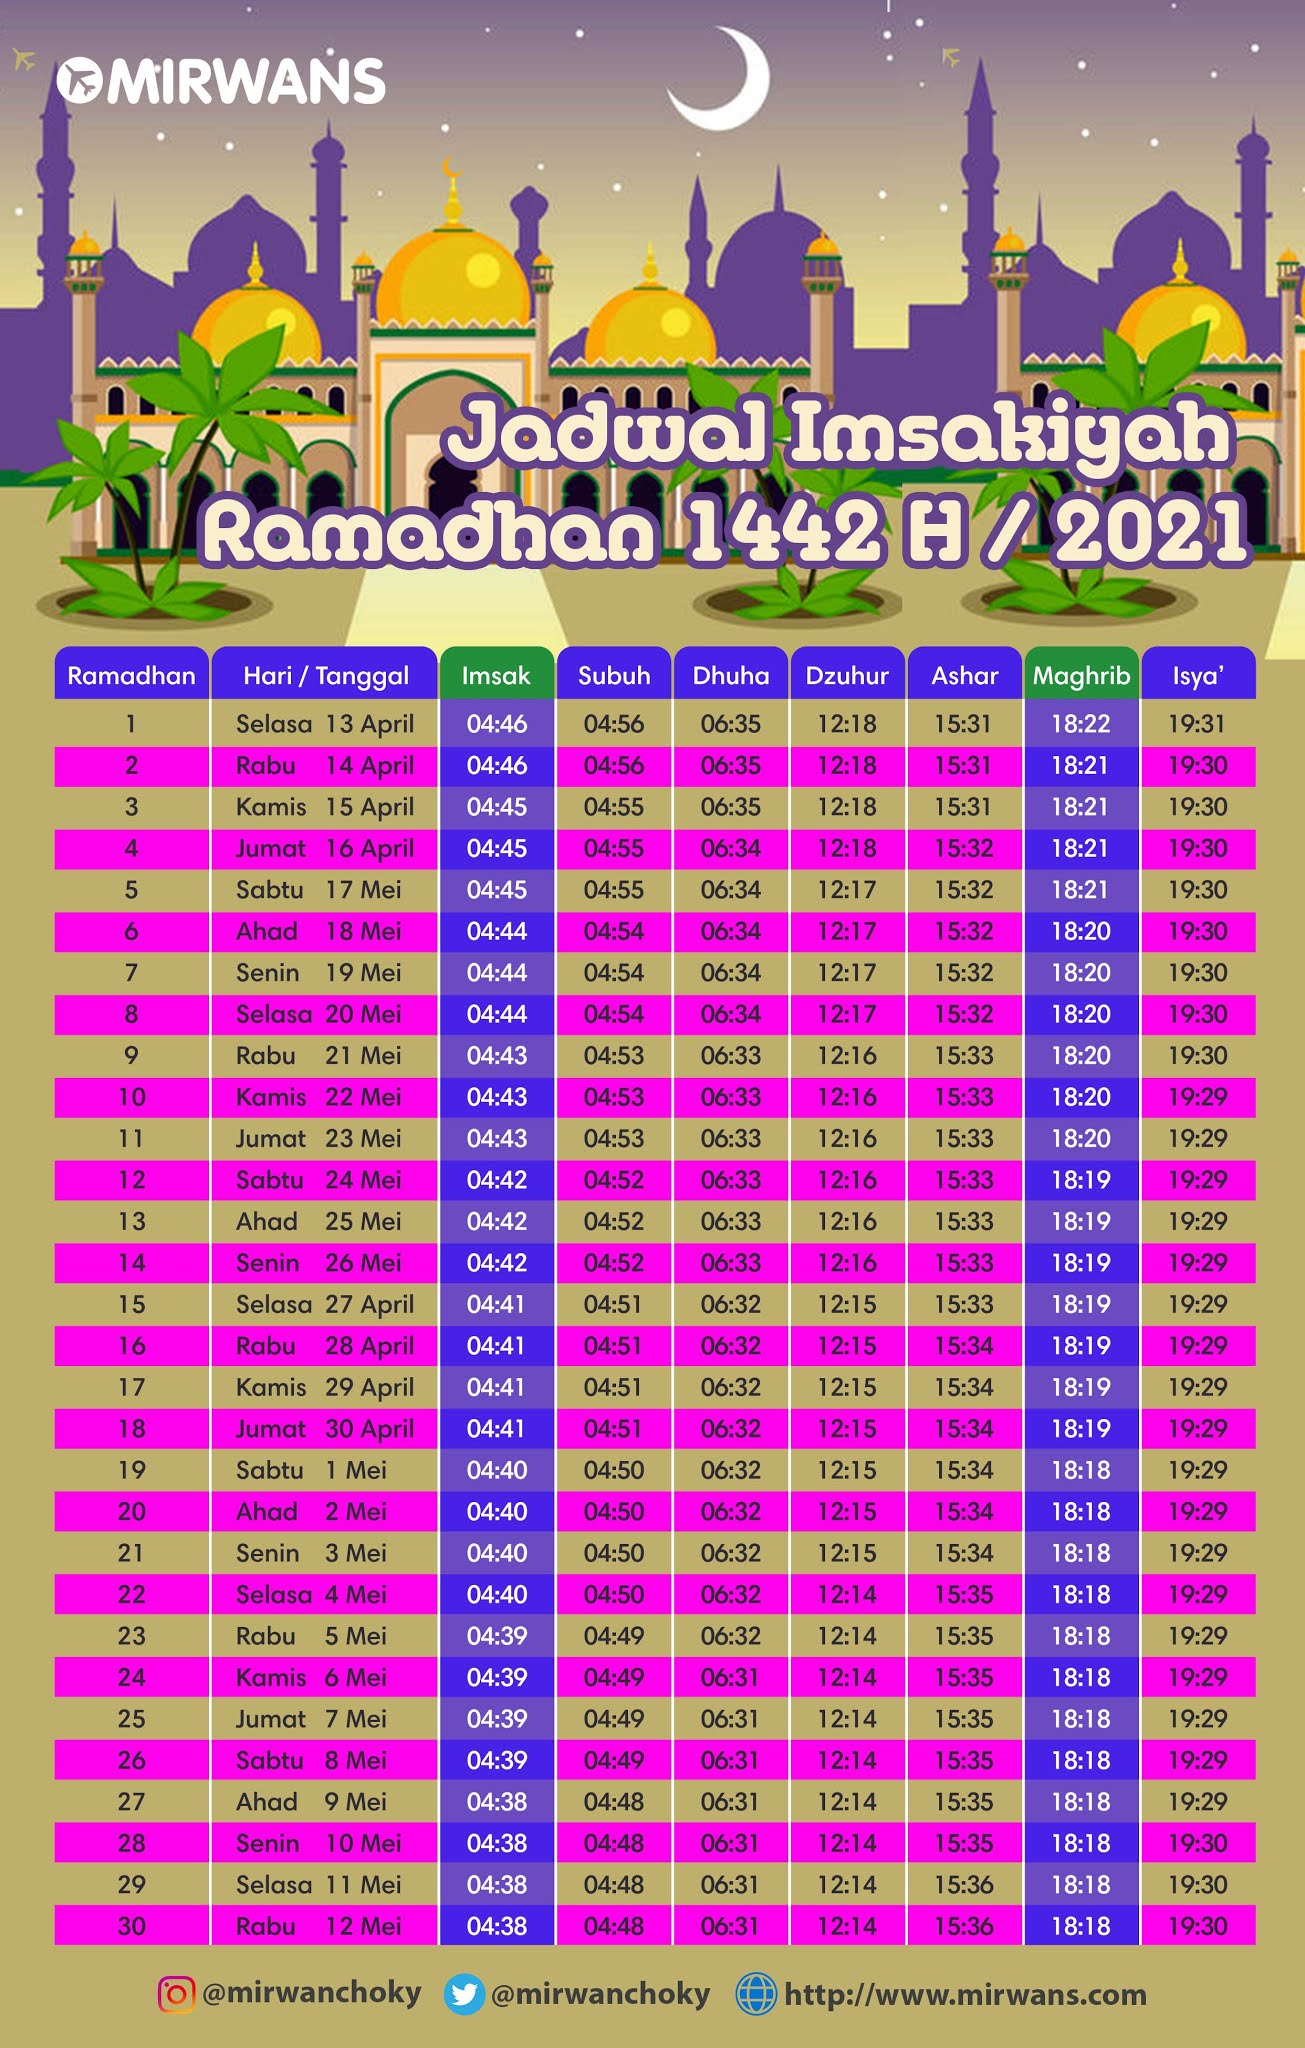 jadwal imsakiyah ramadhan, jadwal imsakiyah ramadhan 2021, jadwal imsakiyah ramadhan 1442 h, jadwal imsakiyah ramadhan pekanbaru